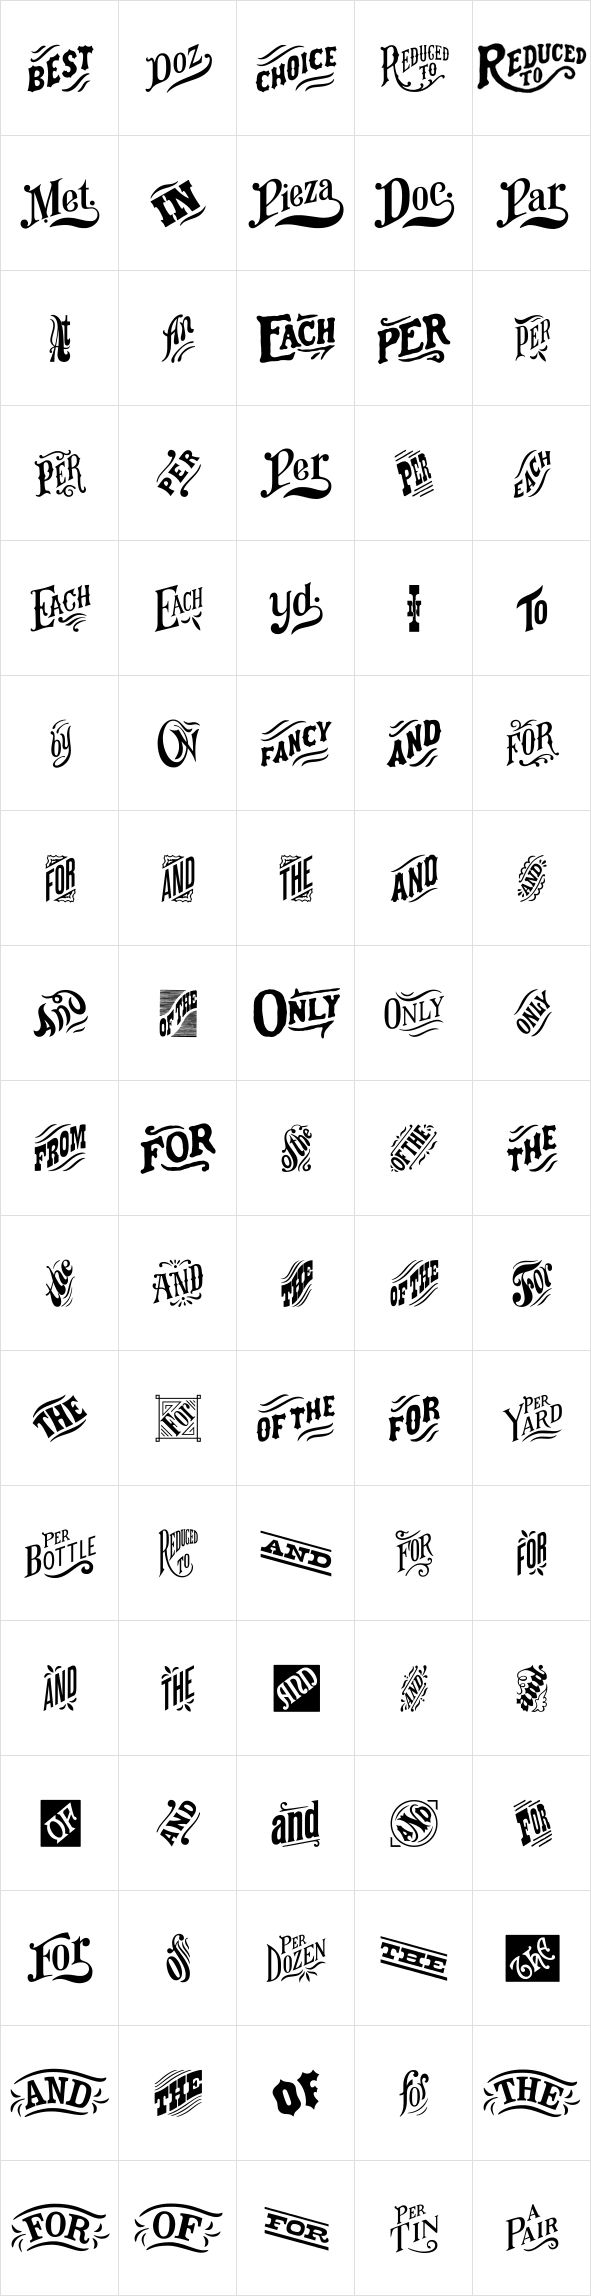 HWT Catchwords by Hamilton Wood Type Foundry - Desktop Font and WebFont - YouWorkForThem.